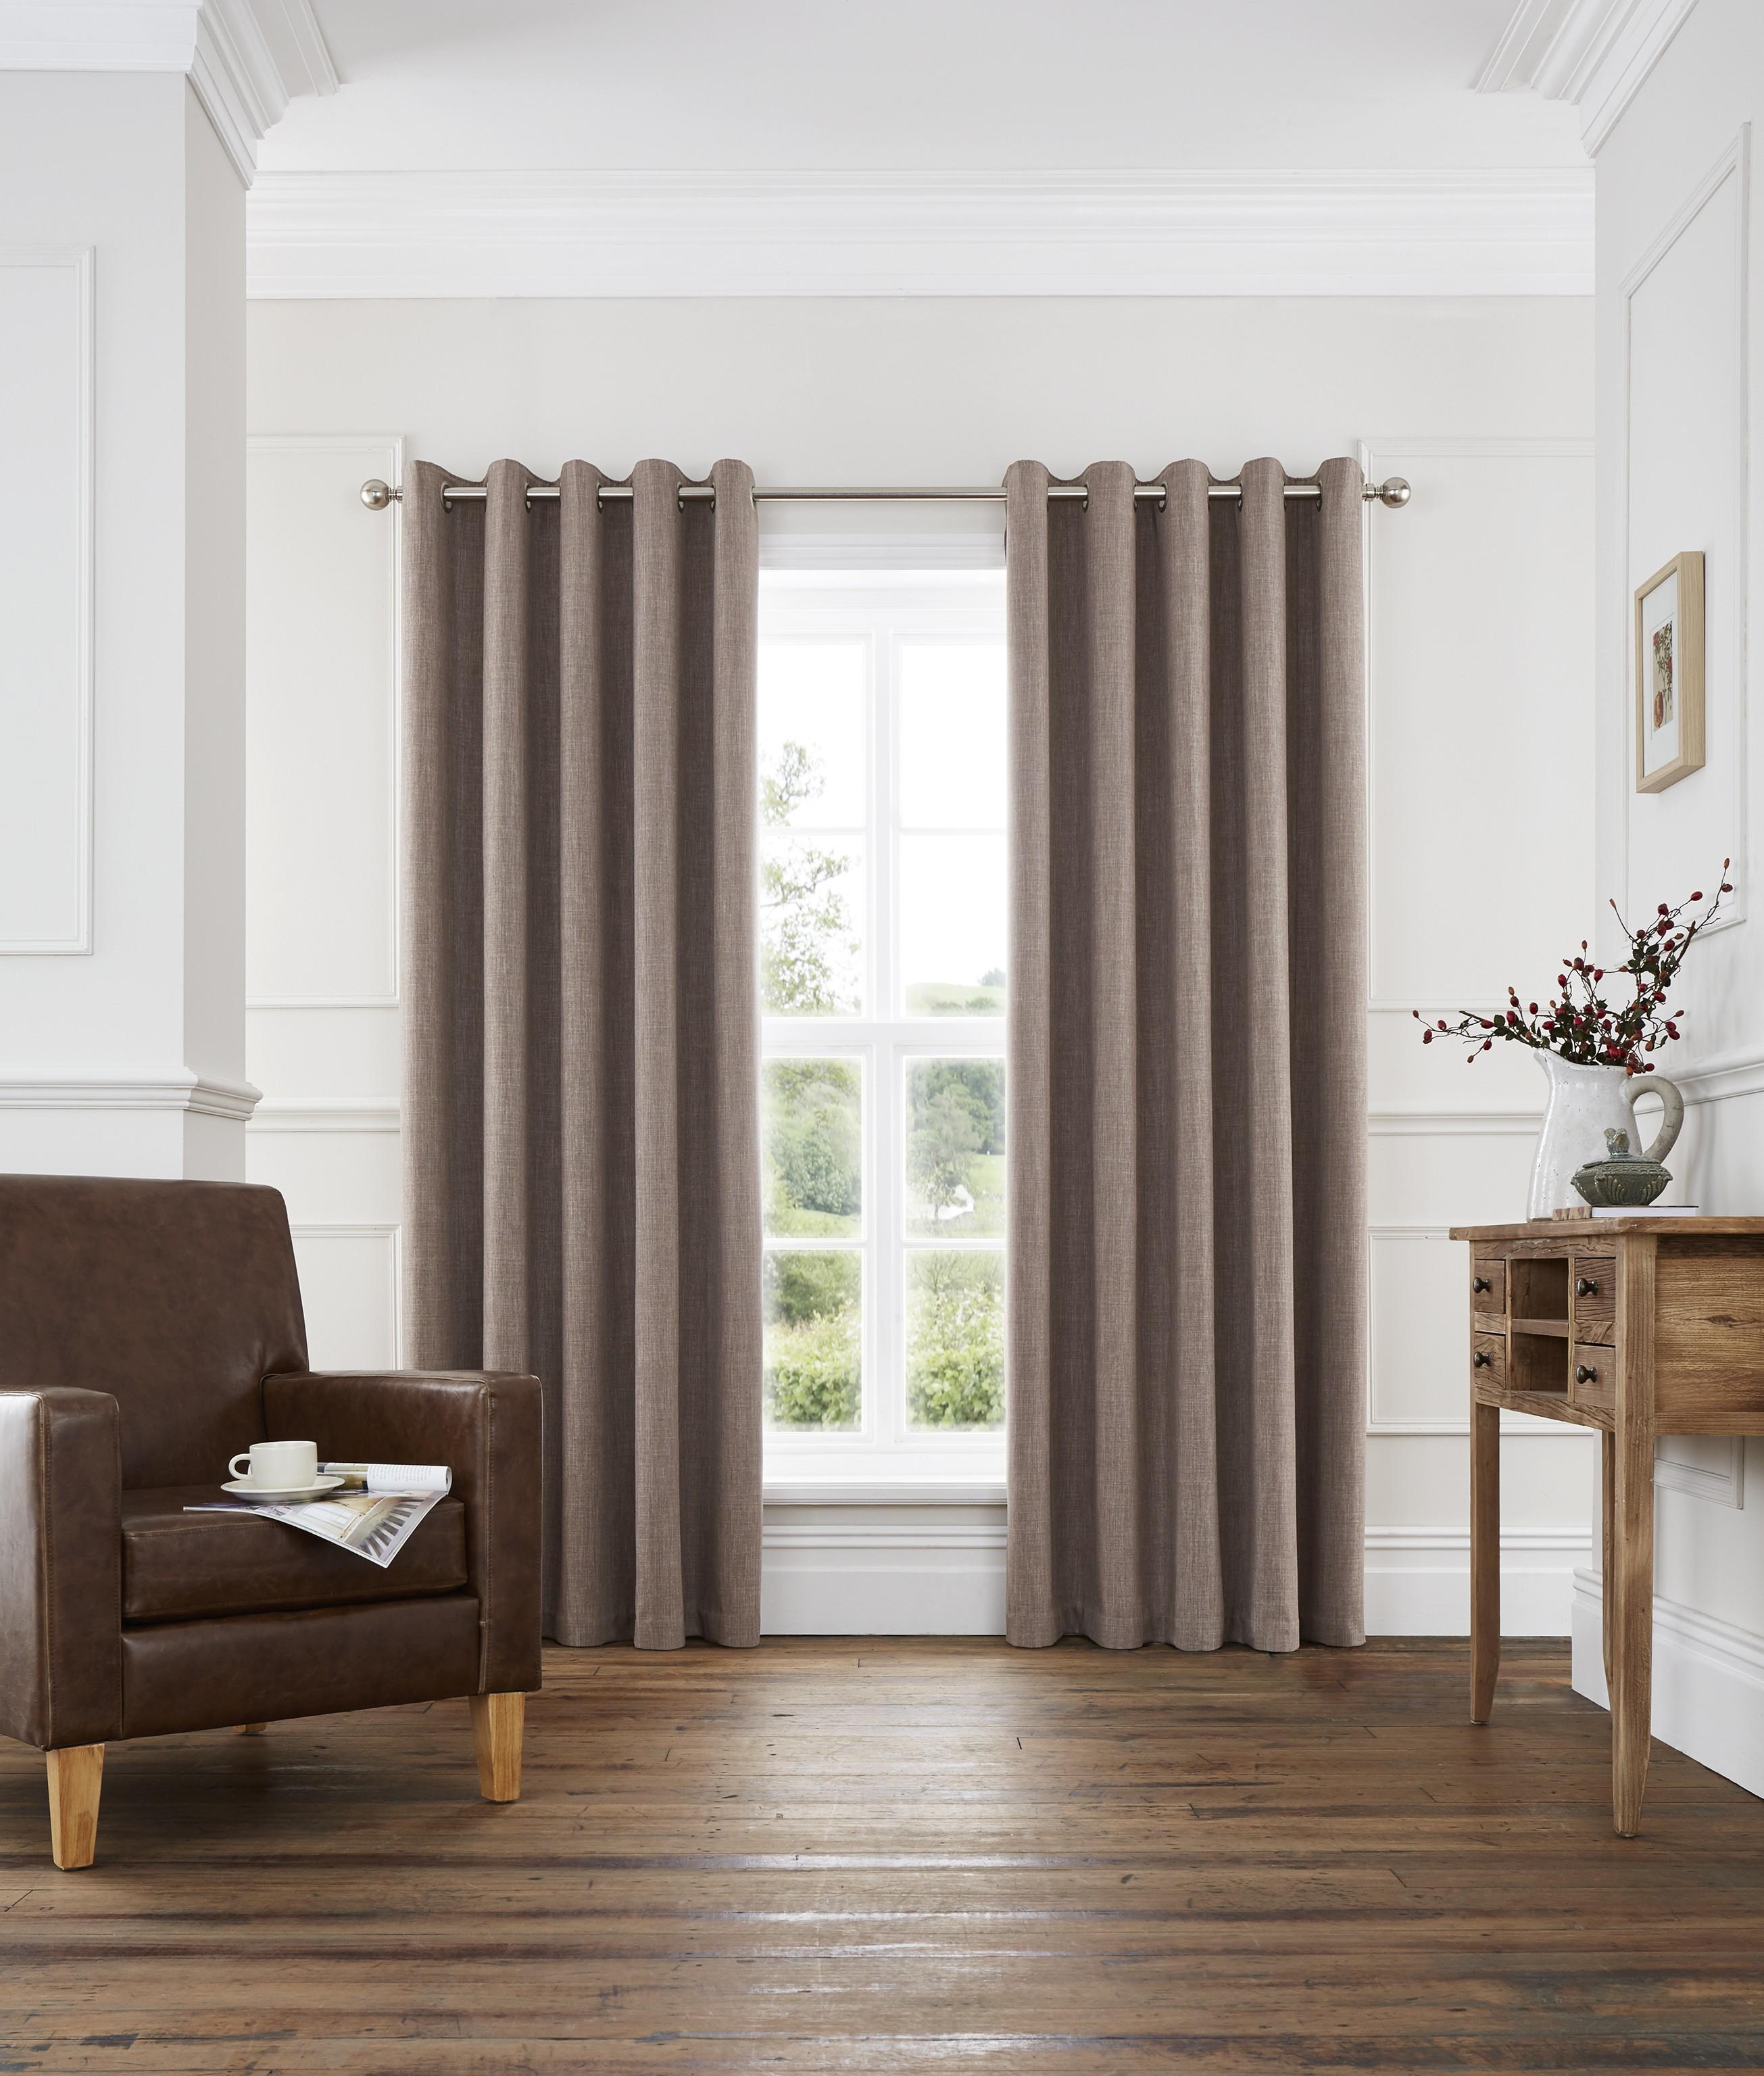 harlow blackout eyelet curtains coffee ponden home. Black Bedroom Furniture Sets. Home Design Ideas